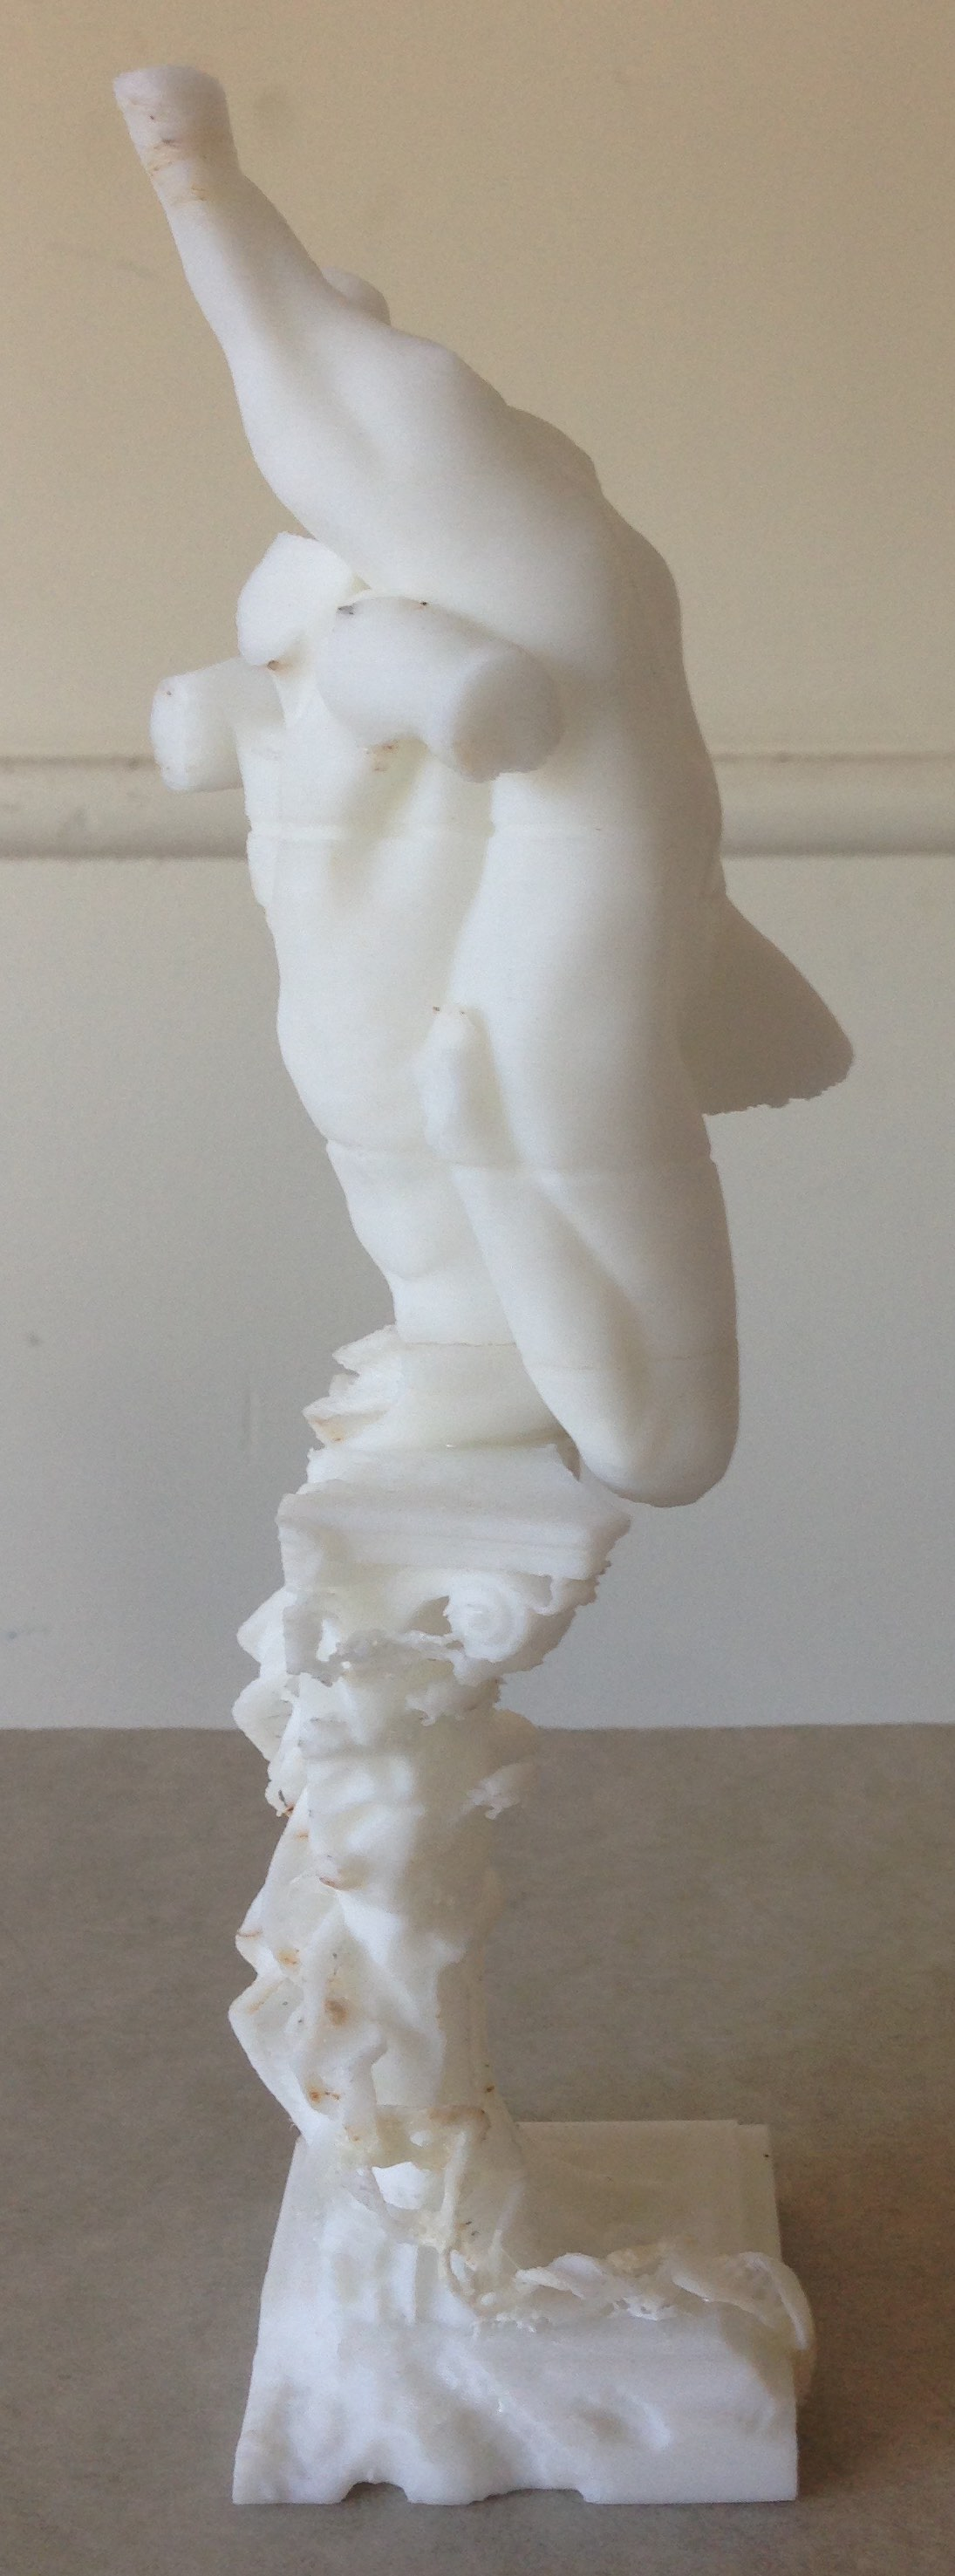 Scott Breton DNA to Digital Sculpture 3D Print4.jpg